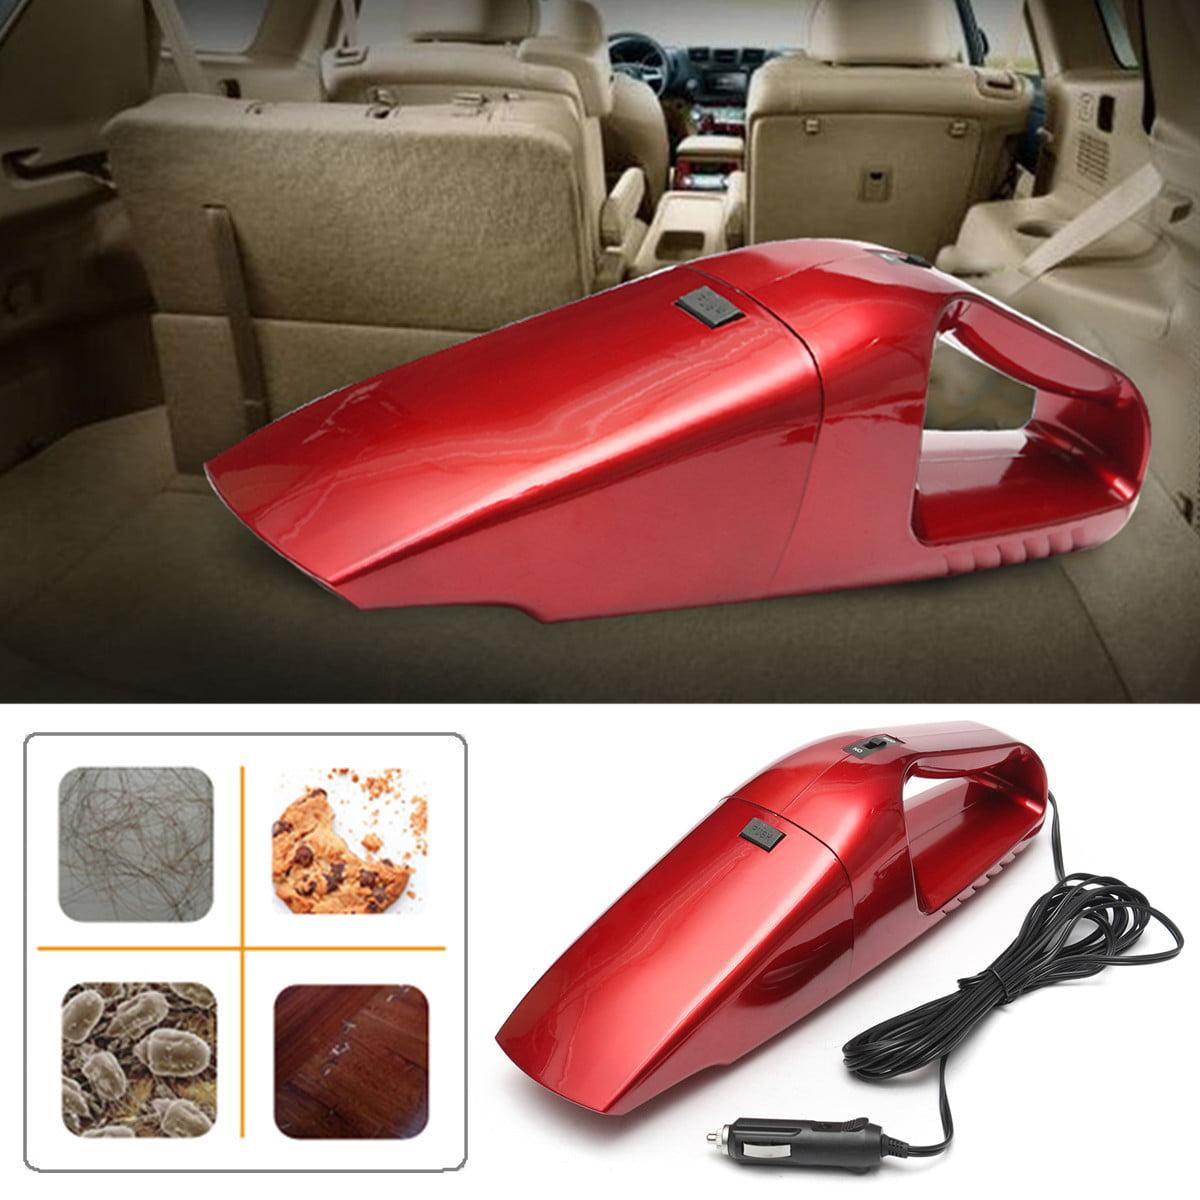 12V 100W Portable Handheld Car Vehicle Wet Dry Cigar Lighter Vacuum Dirt Cleaner by AUDEW